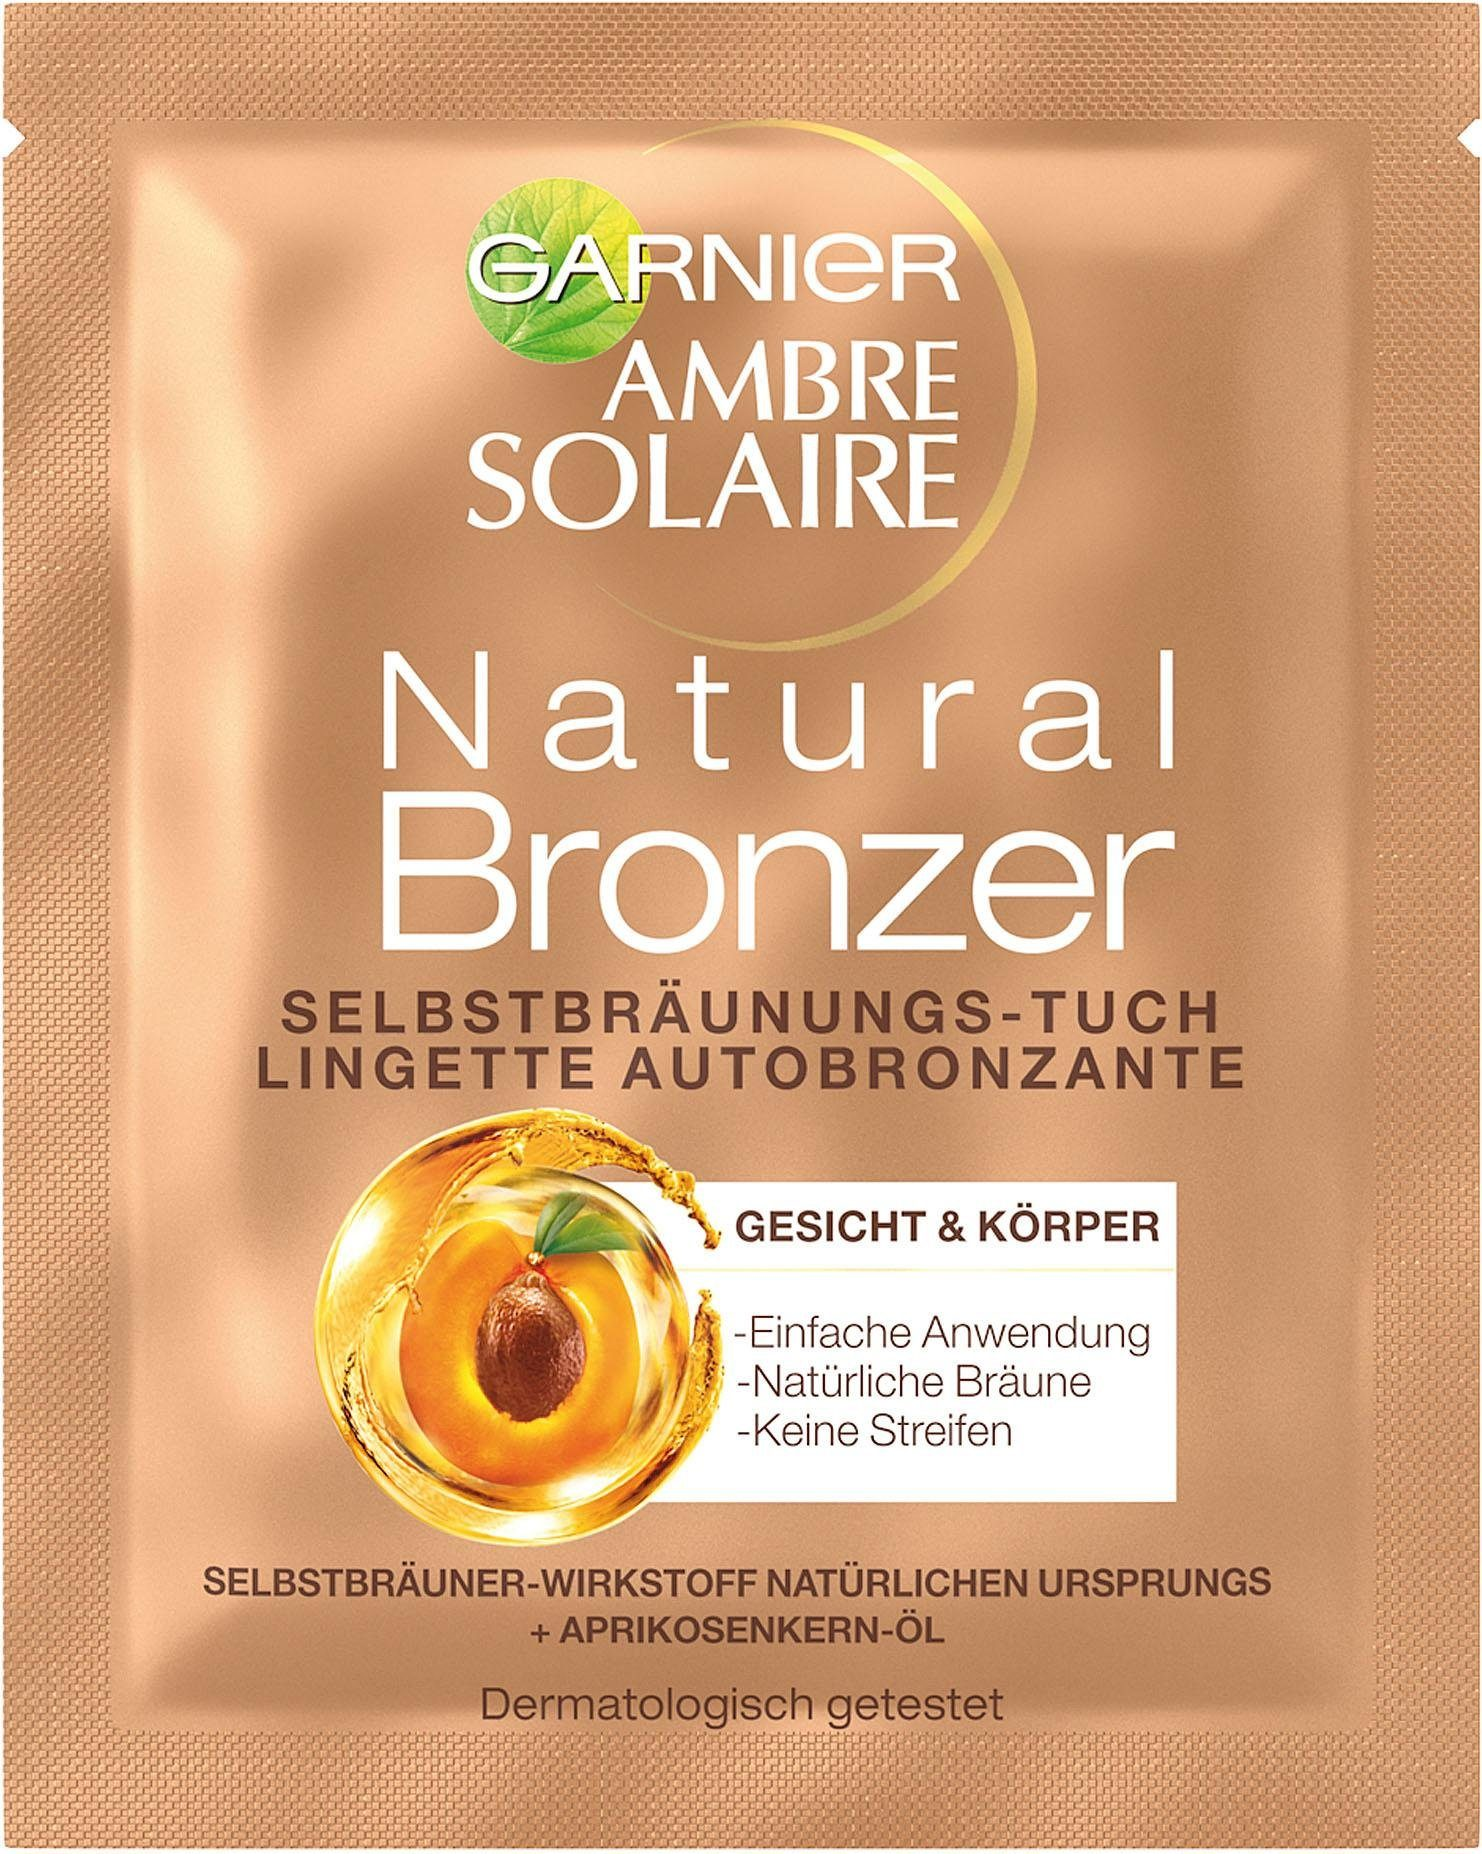 Garnier, »Ambre Solaire Natural Gesichtstuch«, Selbstbräuner